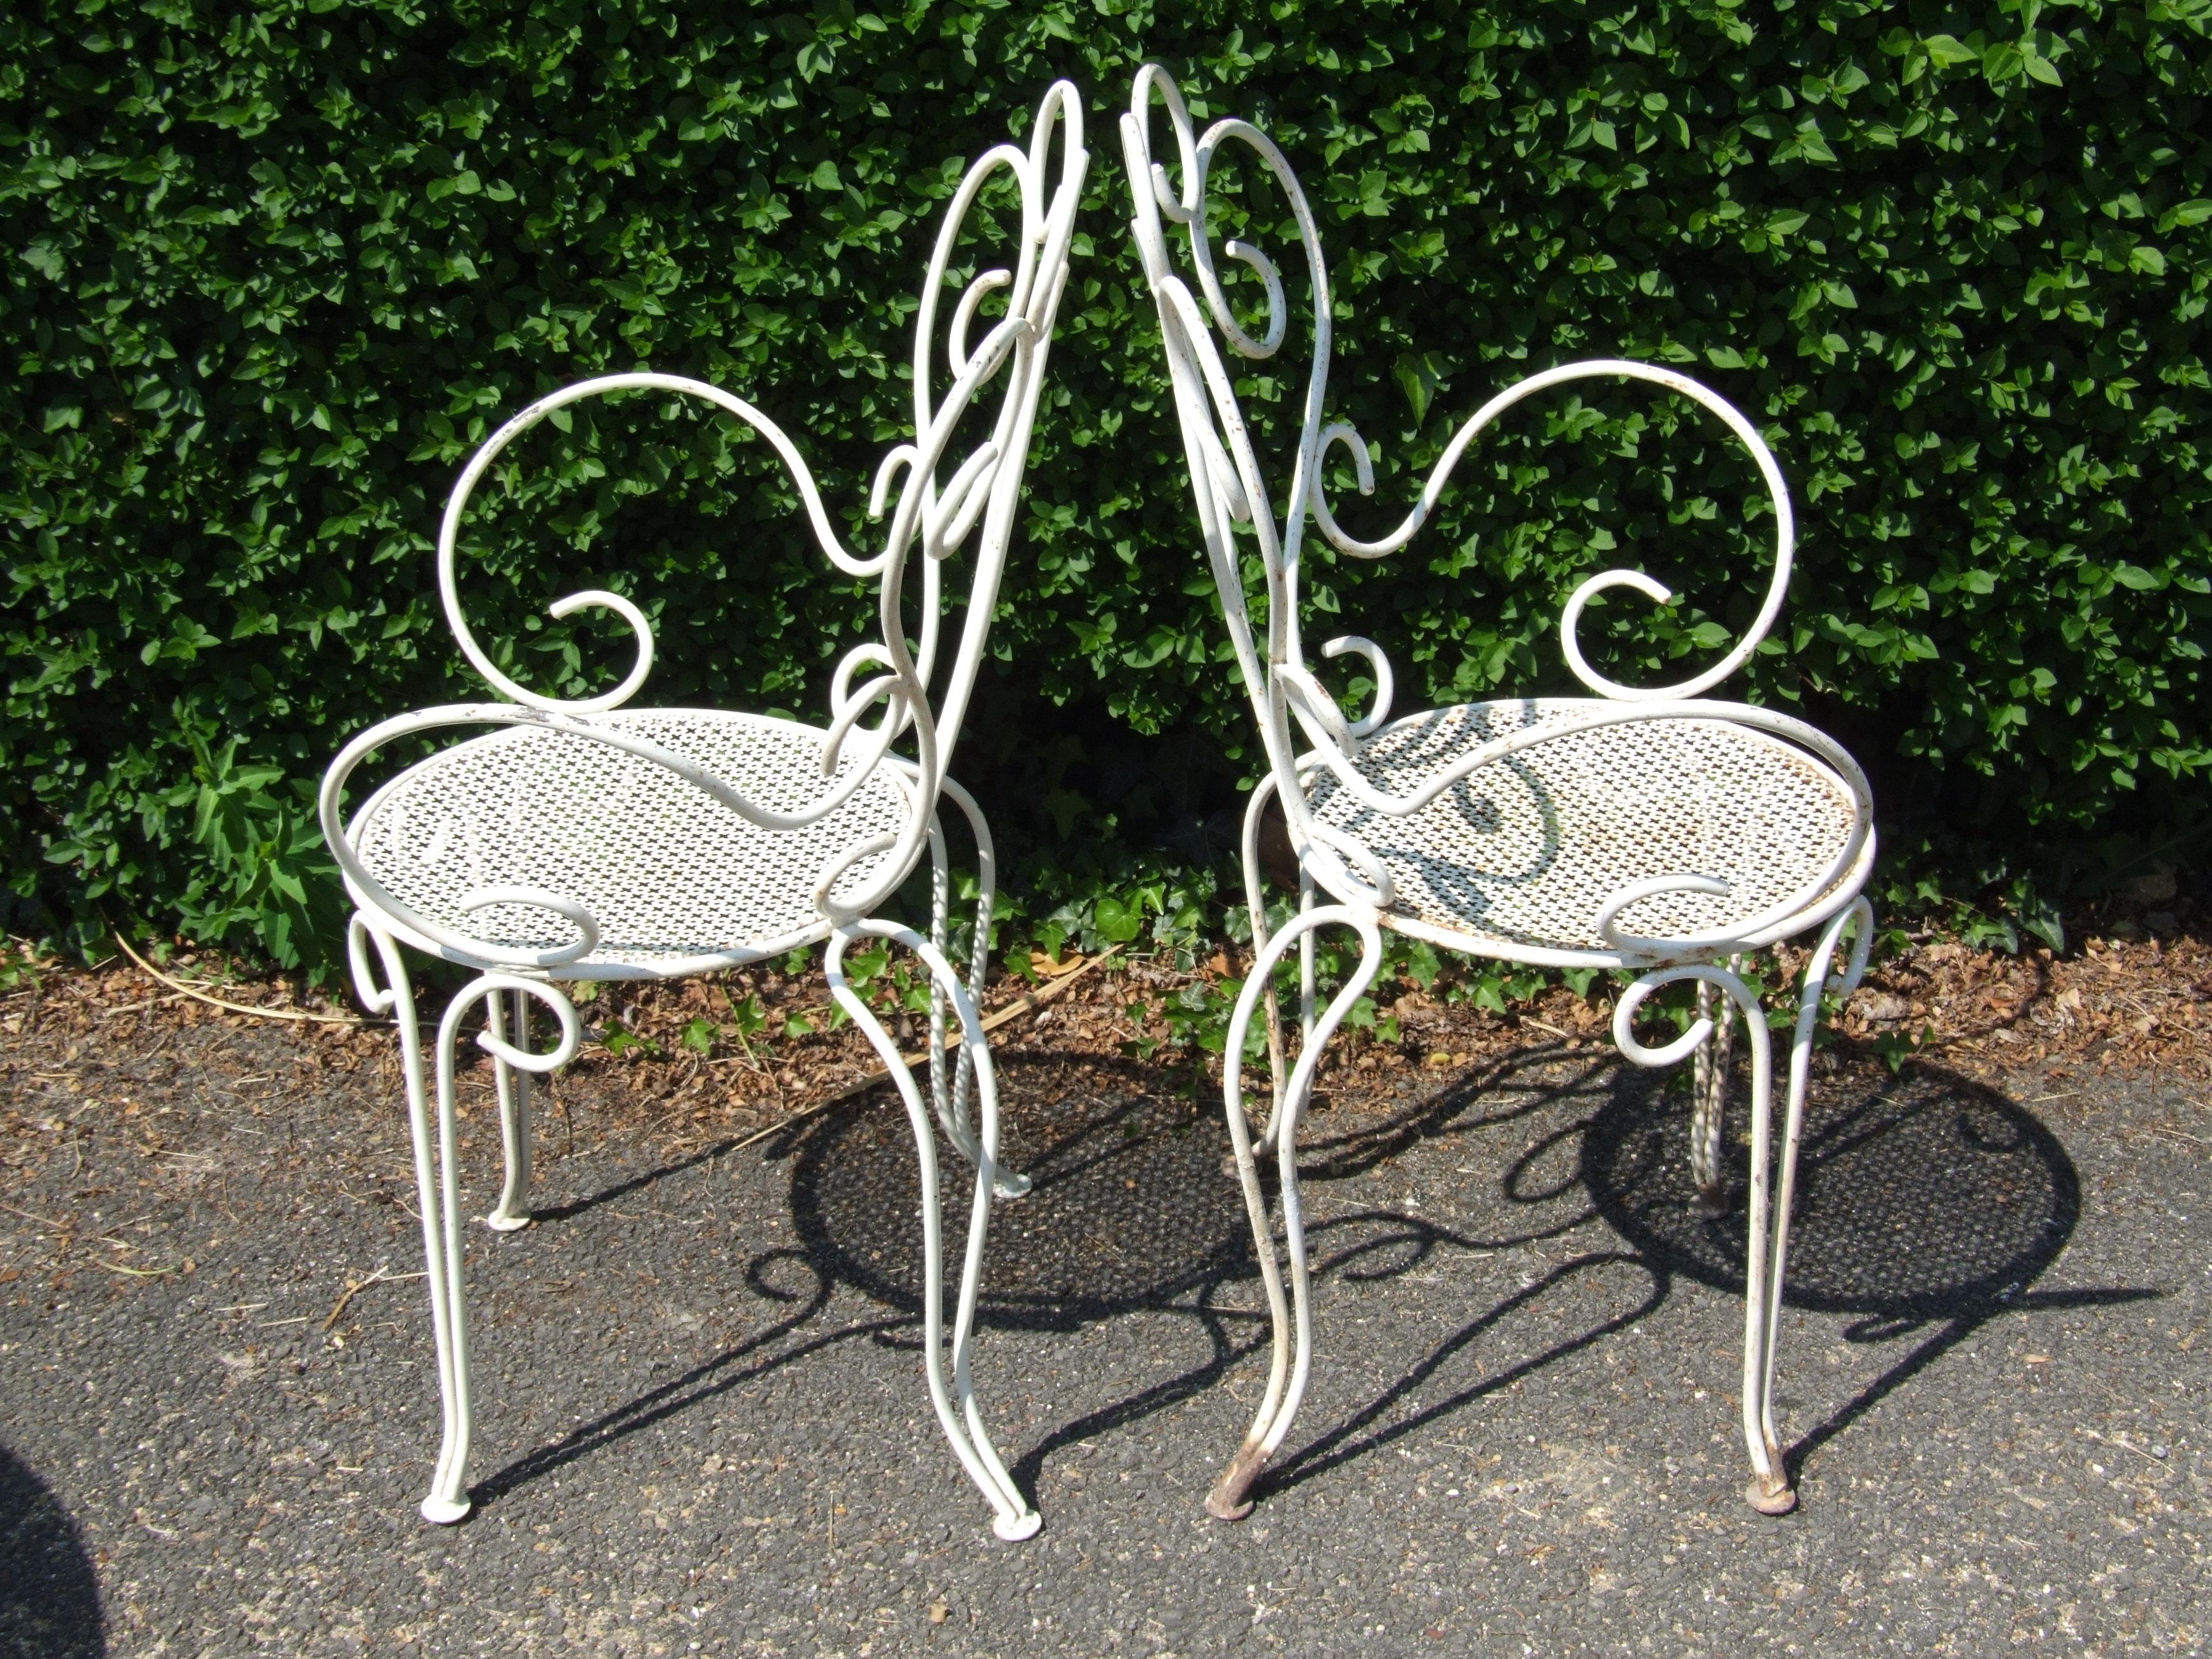 Vintage Patio Umbrellas For Sale Regarding Famous Chair (Gallery 14 of 20)